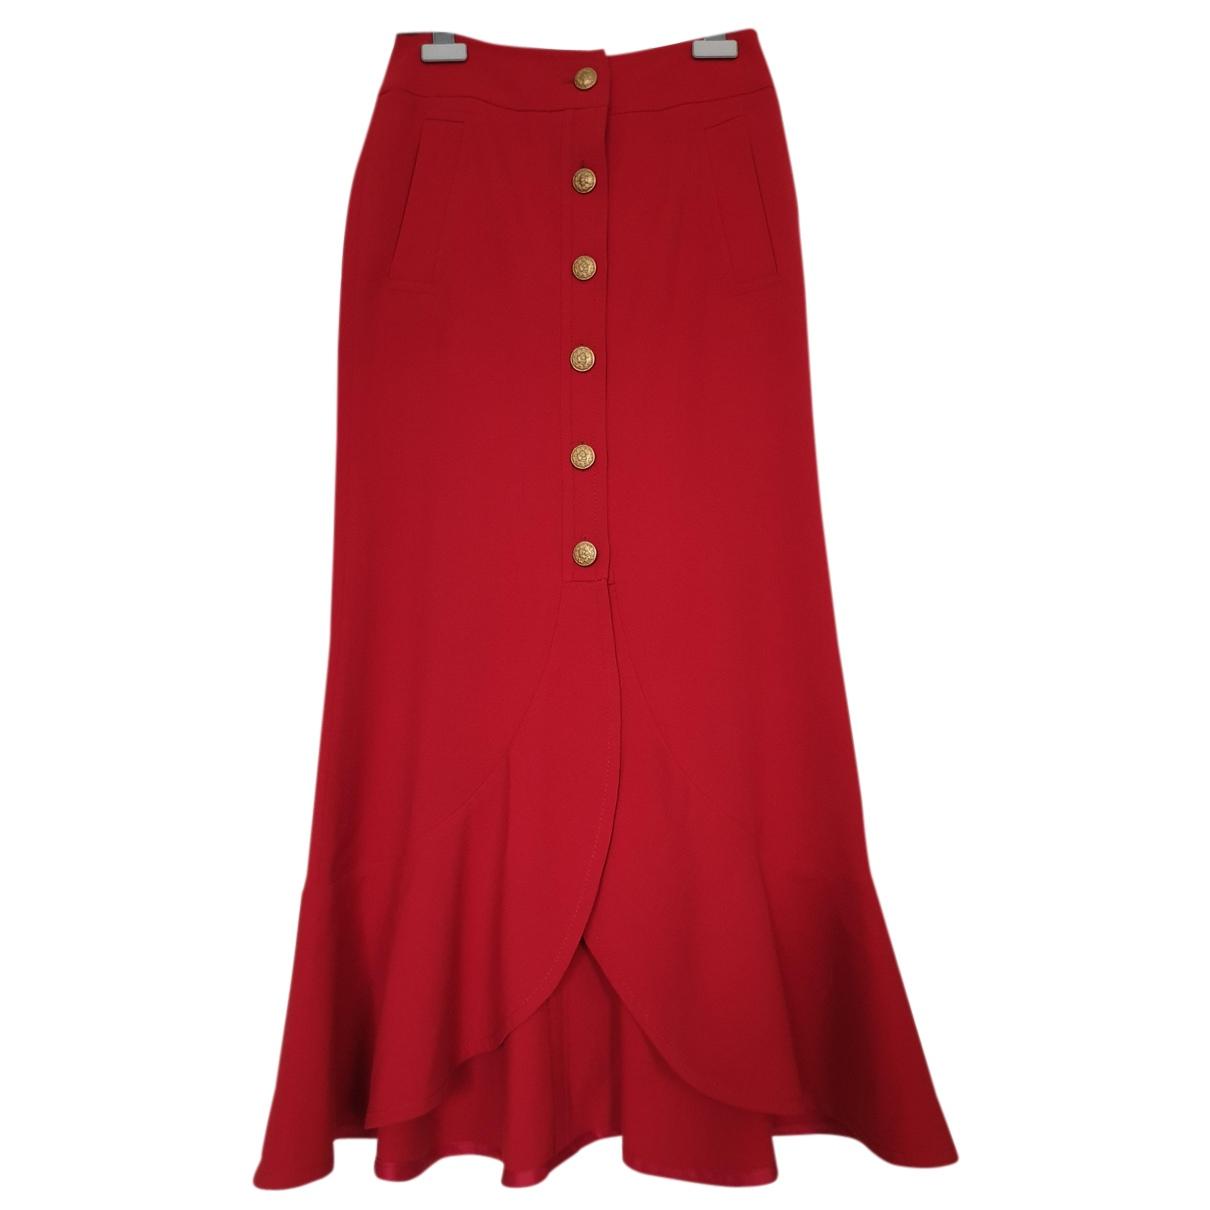 Alberta Ferretti - Jupe   pour femme en laine - rouge